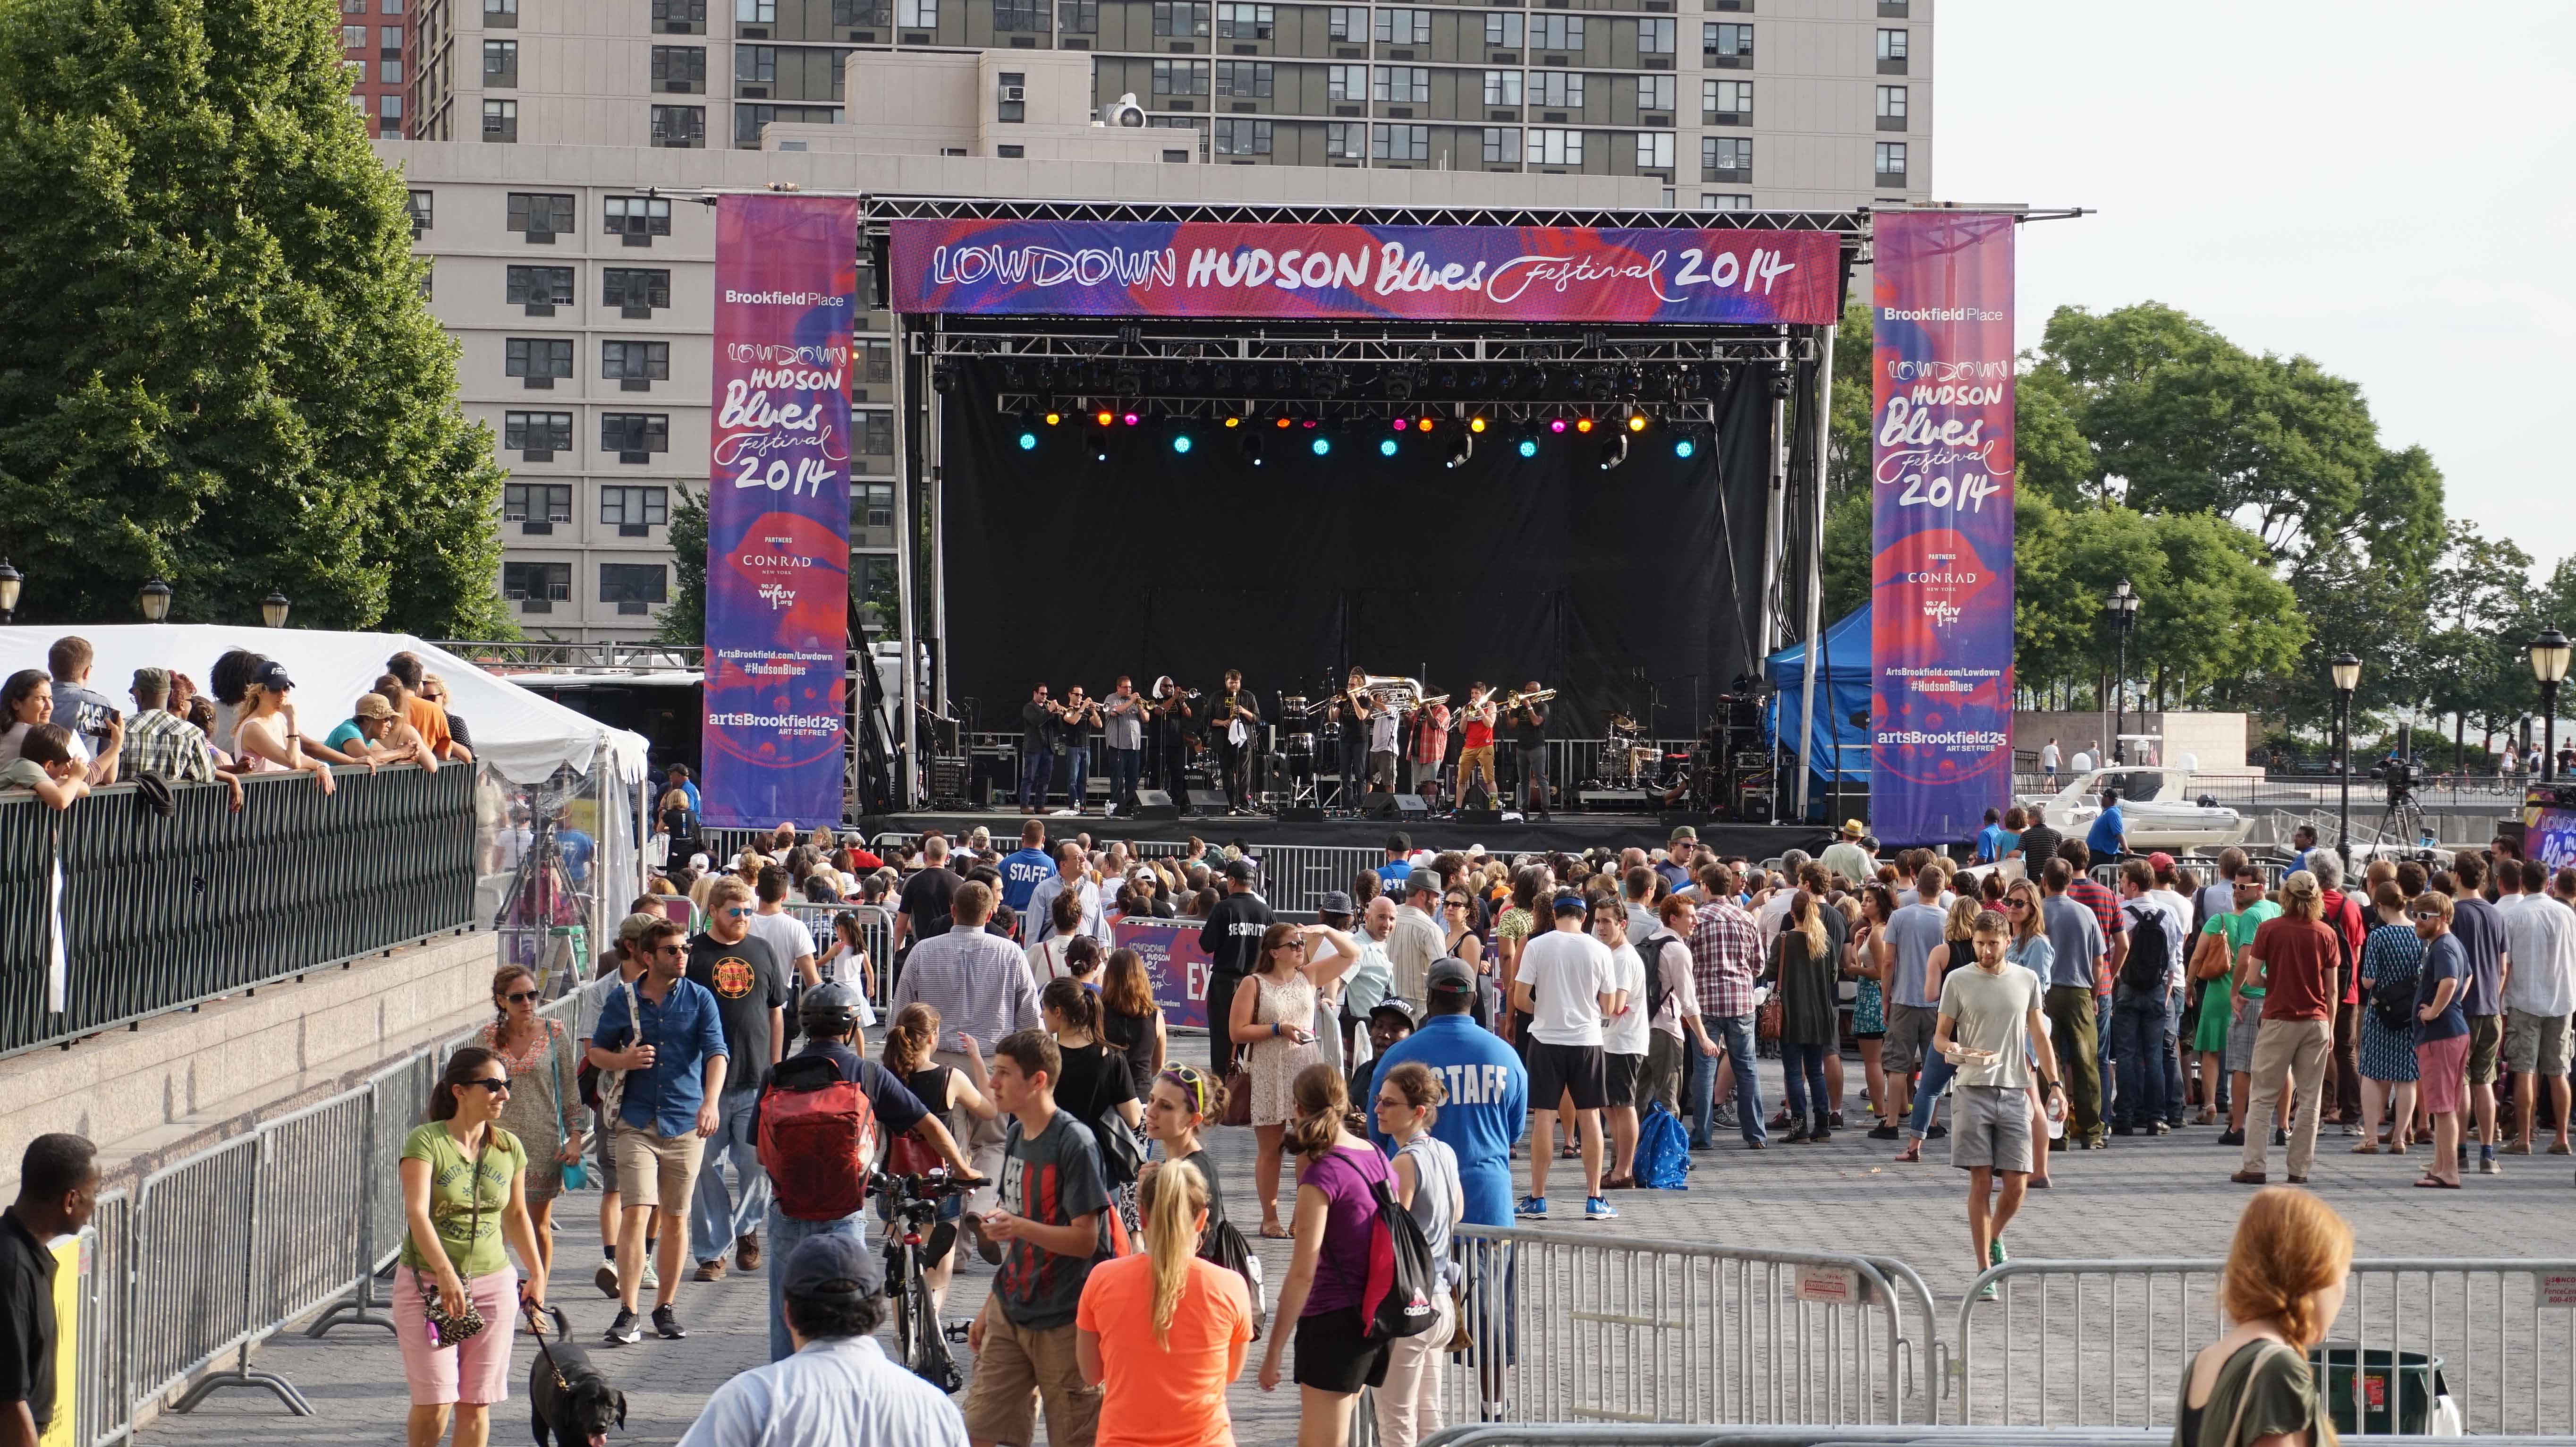 Lowdown Hudson Blues stage 7-16-2014 low res